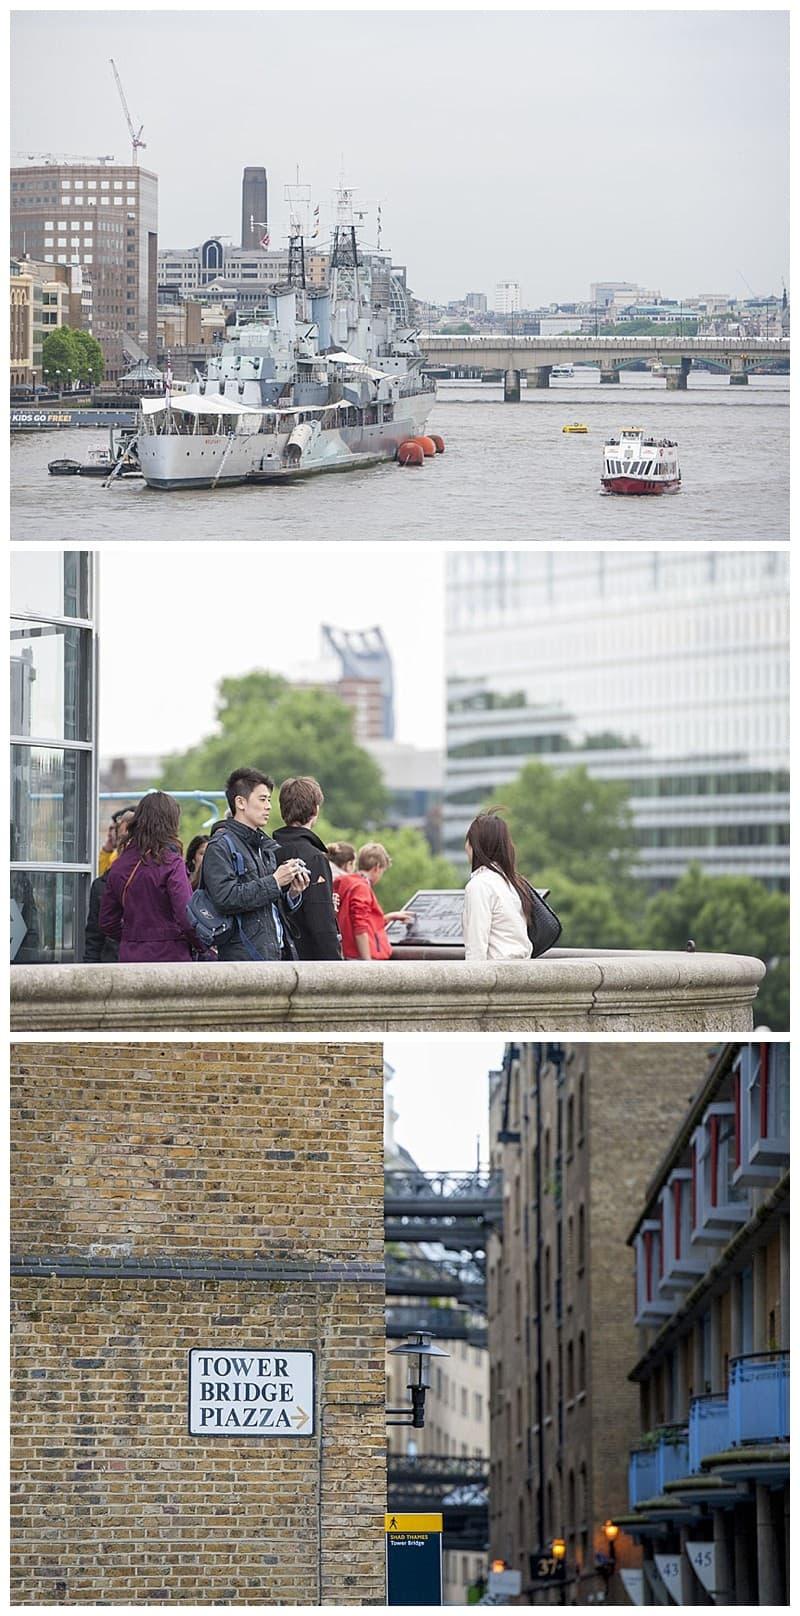 Kyle & Mandy Engagement Photoshoot, Tower Bridge, London, Benjamin Wetherall Photography0006